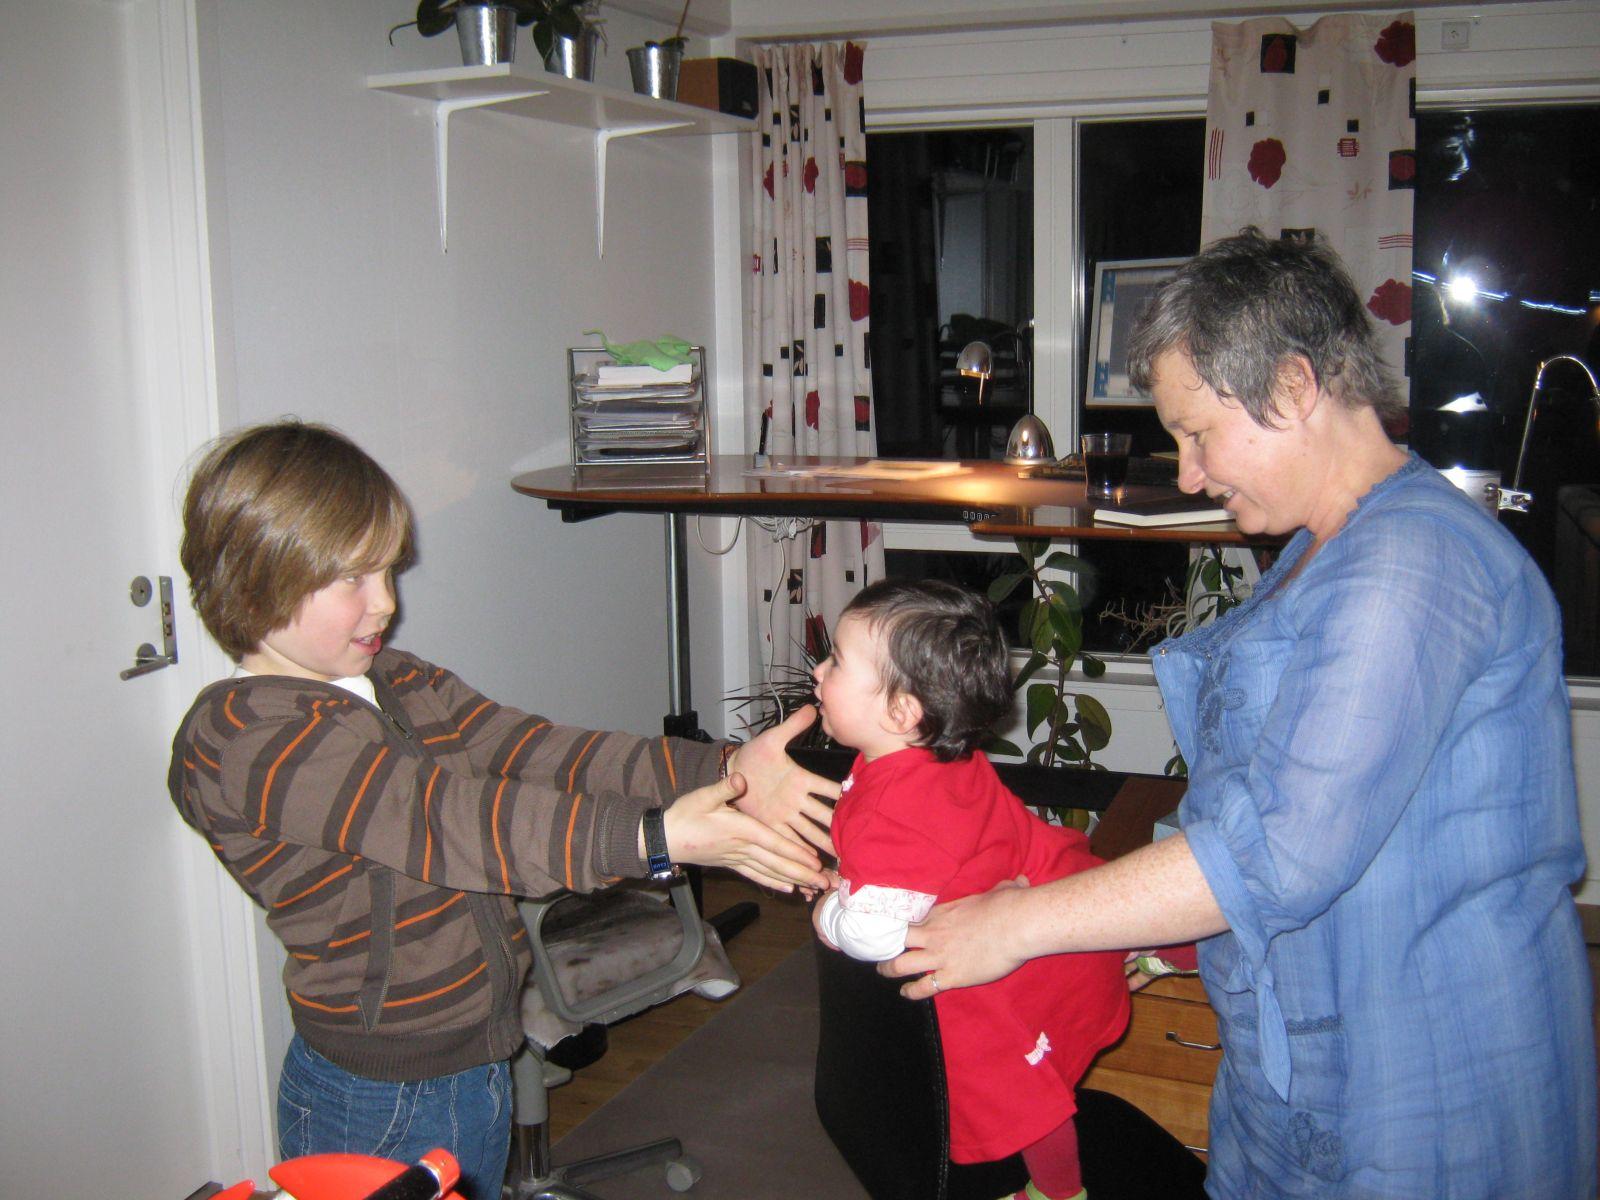 2009-10-31-1833_Mette Labansen; Qupanuk Eugenius Labansen; Rumle Labansen